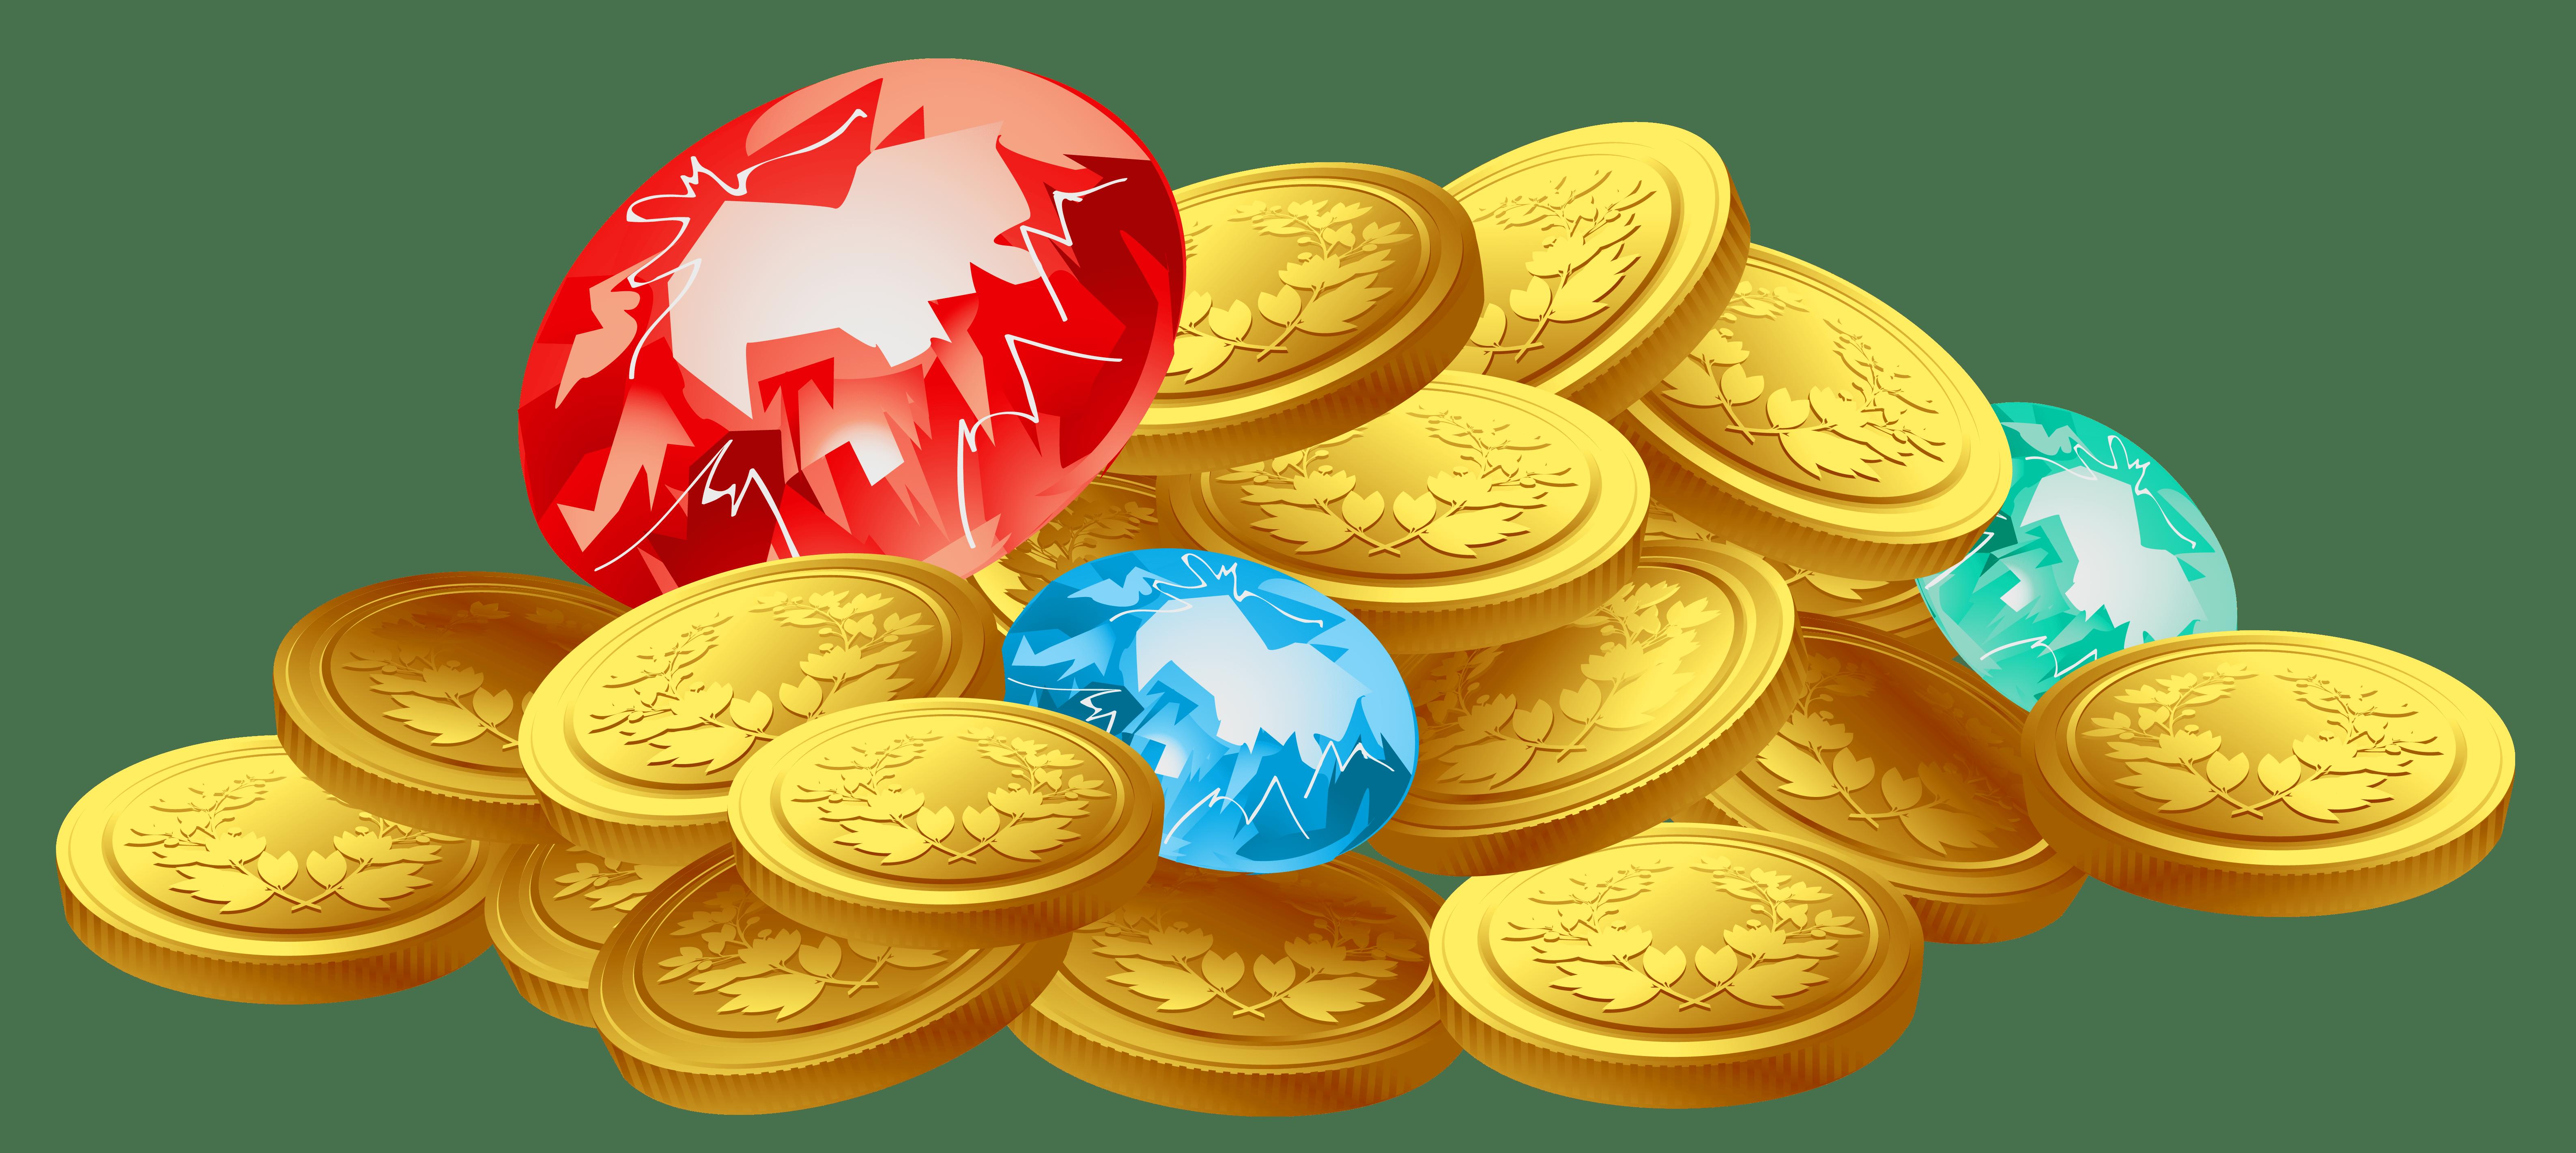 Pirate money clipart picture transparent stock Treasure Box Png - Ivoiregion picture transparent stock